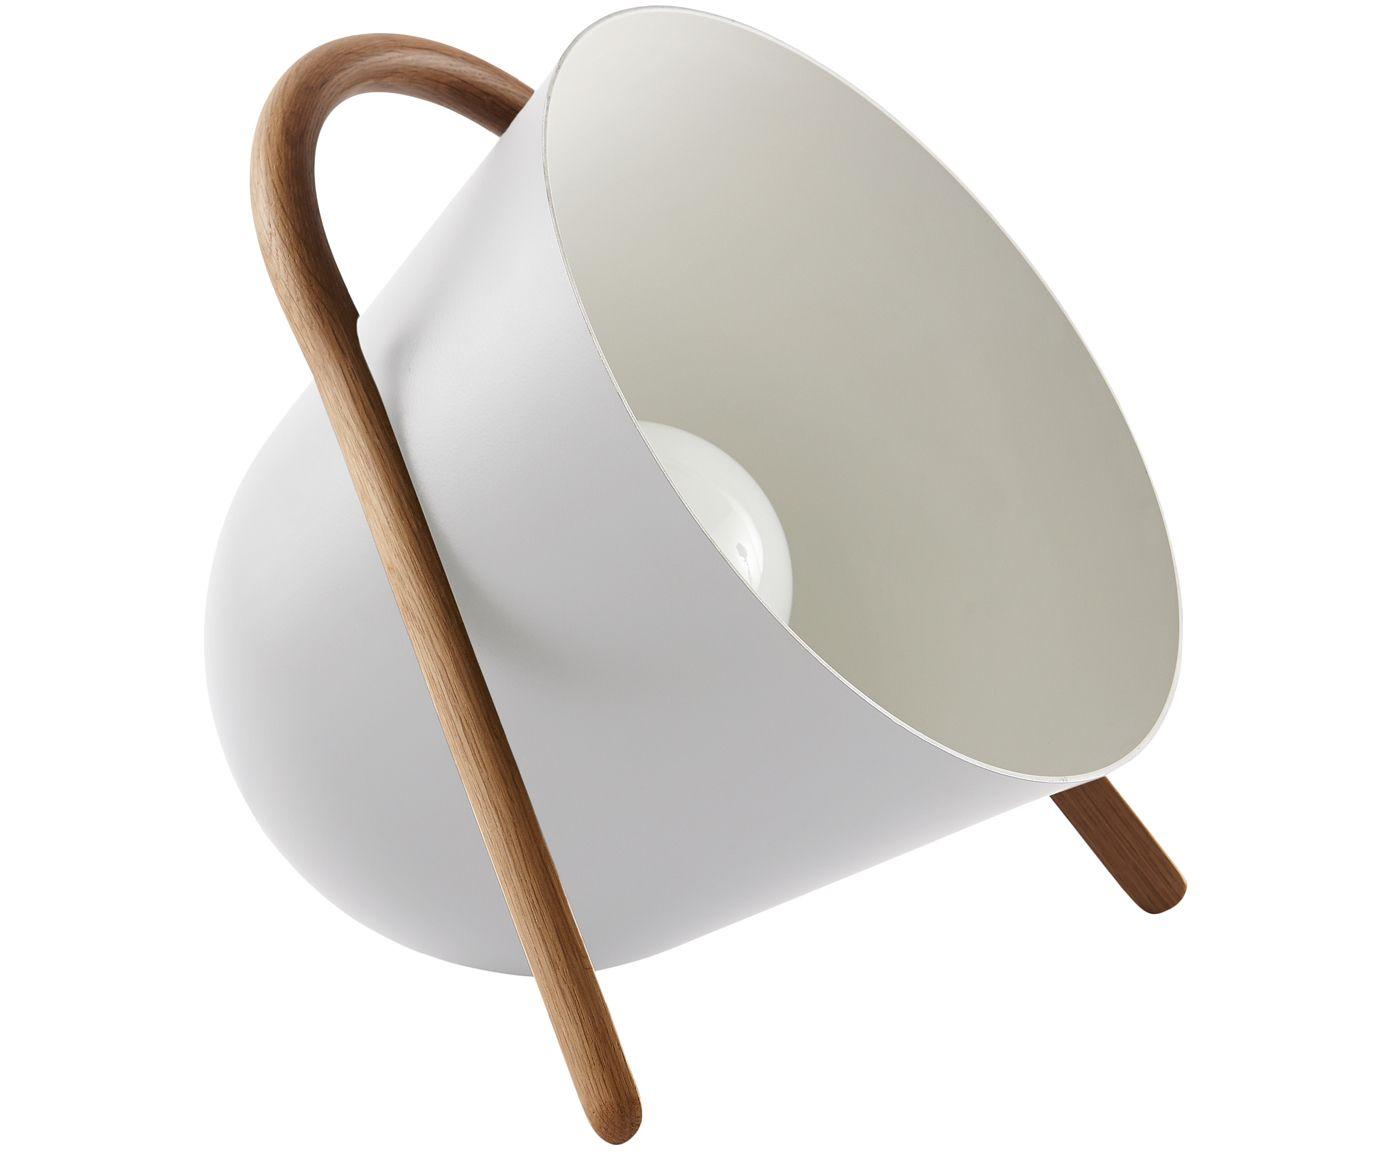 Bodenleuchte Elma >> WestwingNow | Lampe, Tisch, Lampen